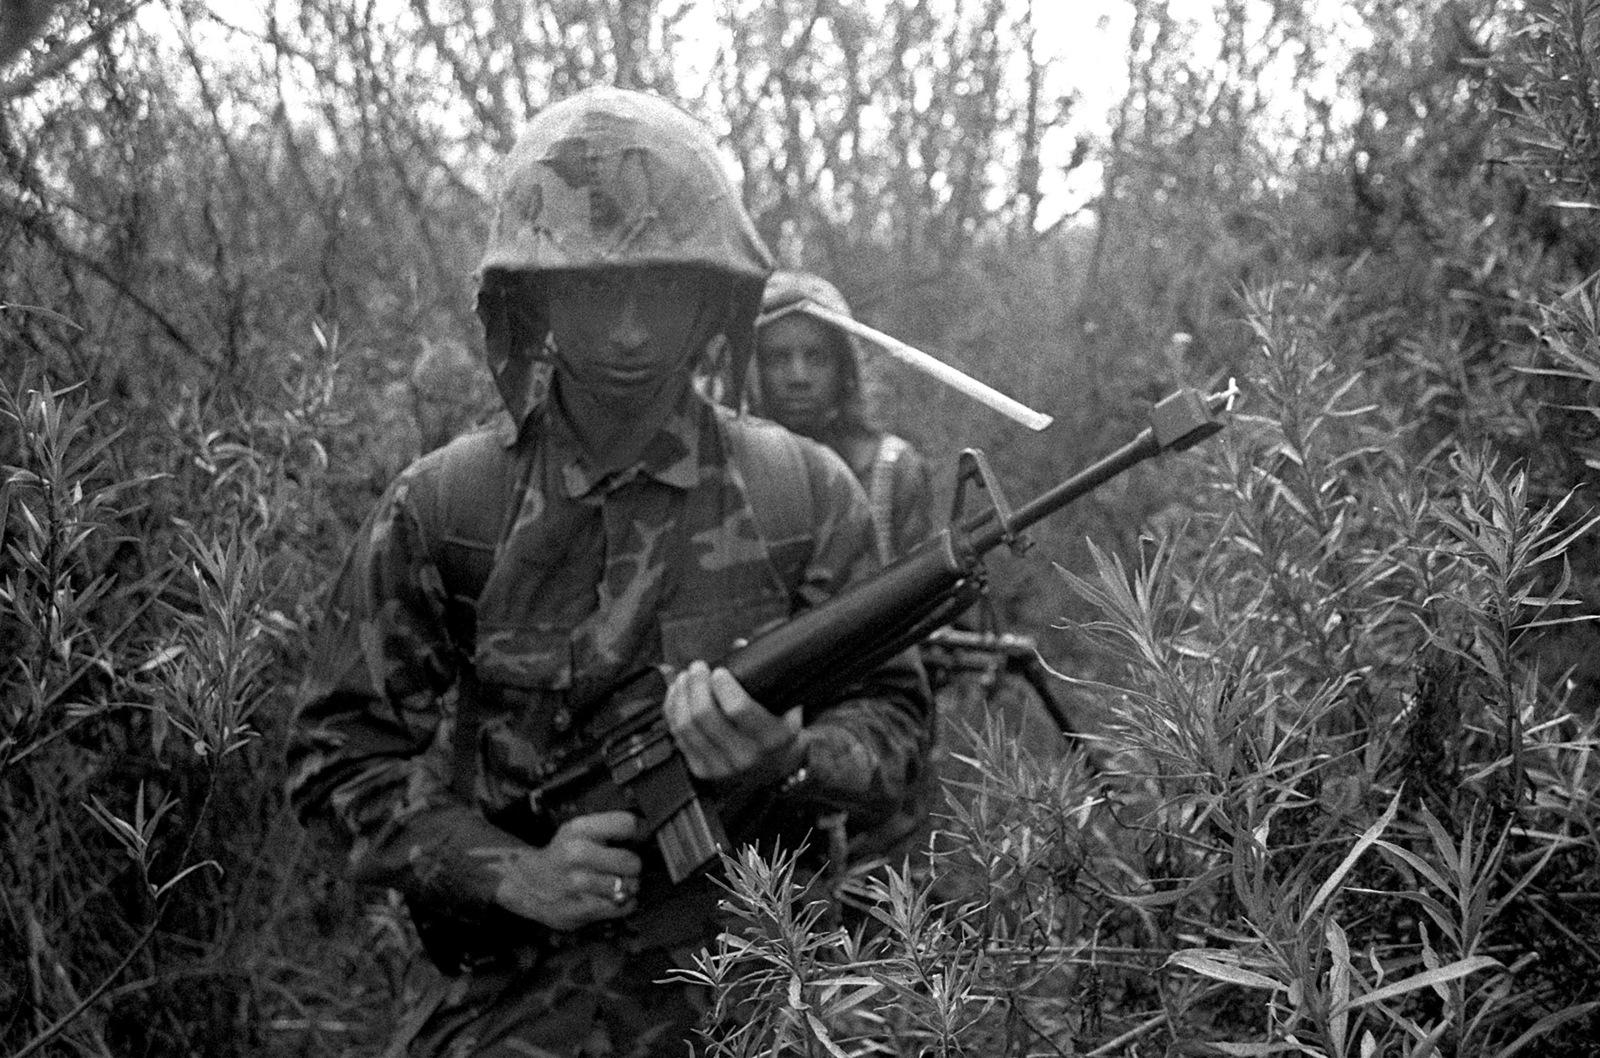 PFC Phillip Pendleton, great grand nephew of the late MGEN Joseph H. Pendleton, goes through infantry training